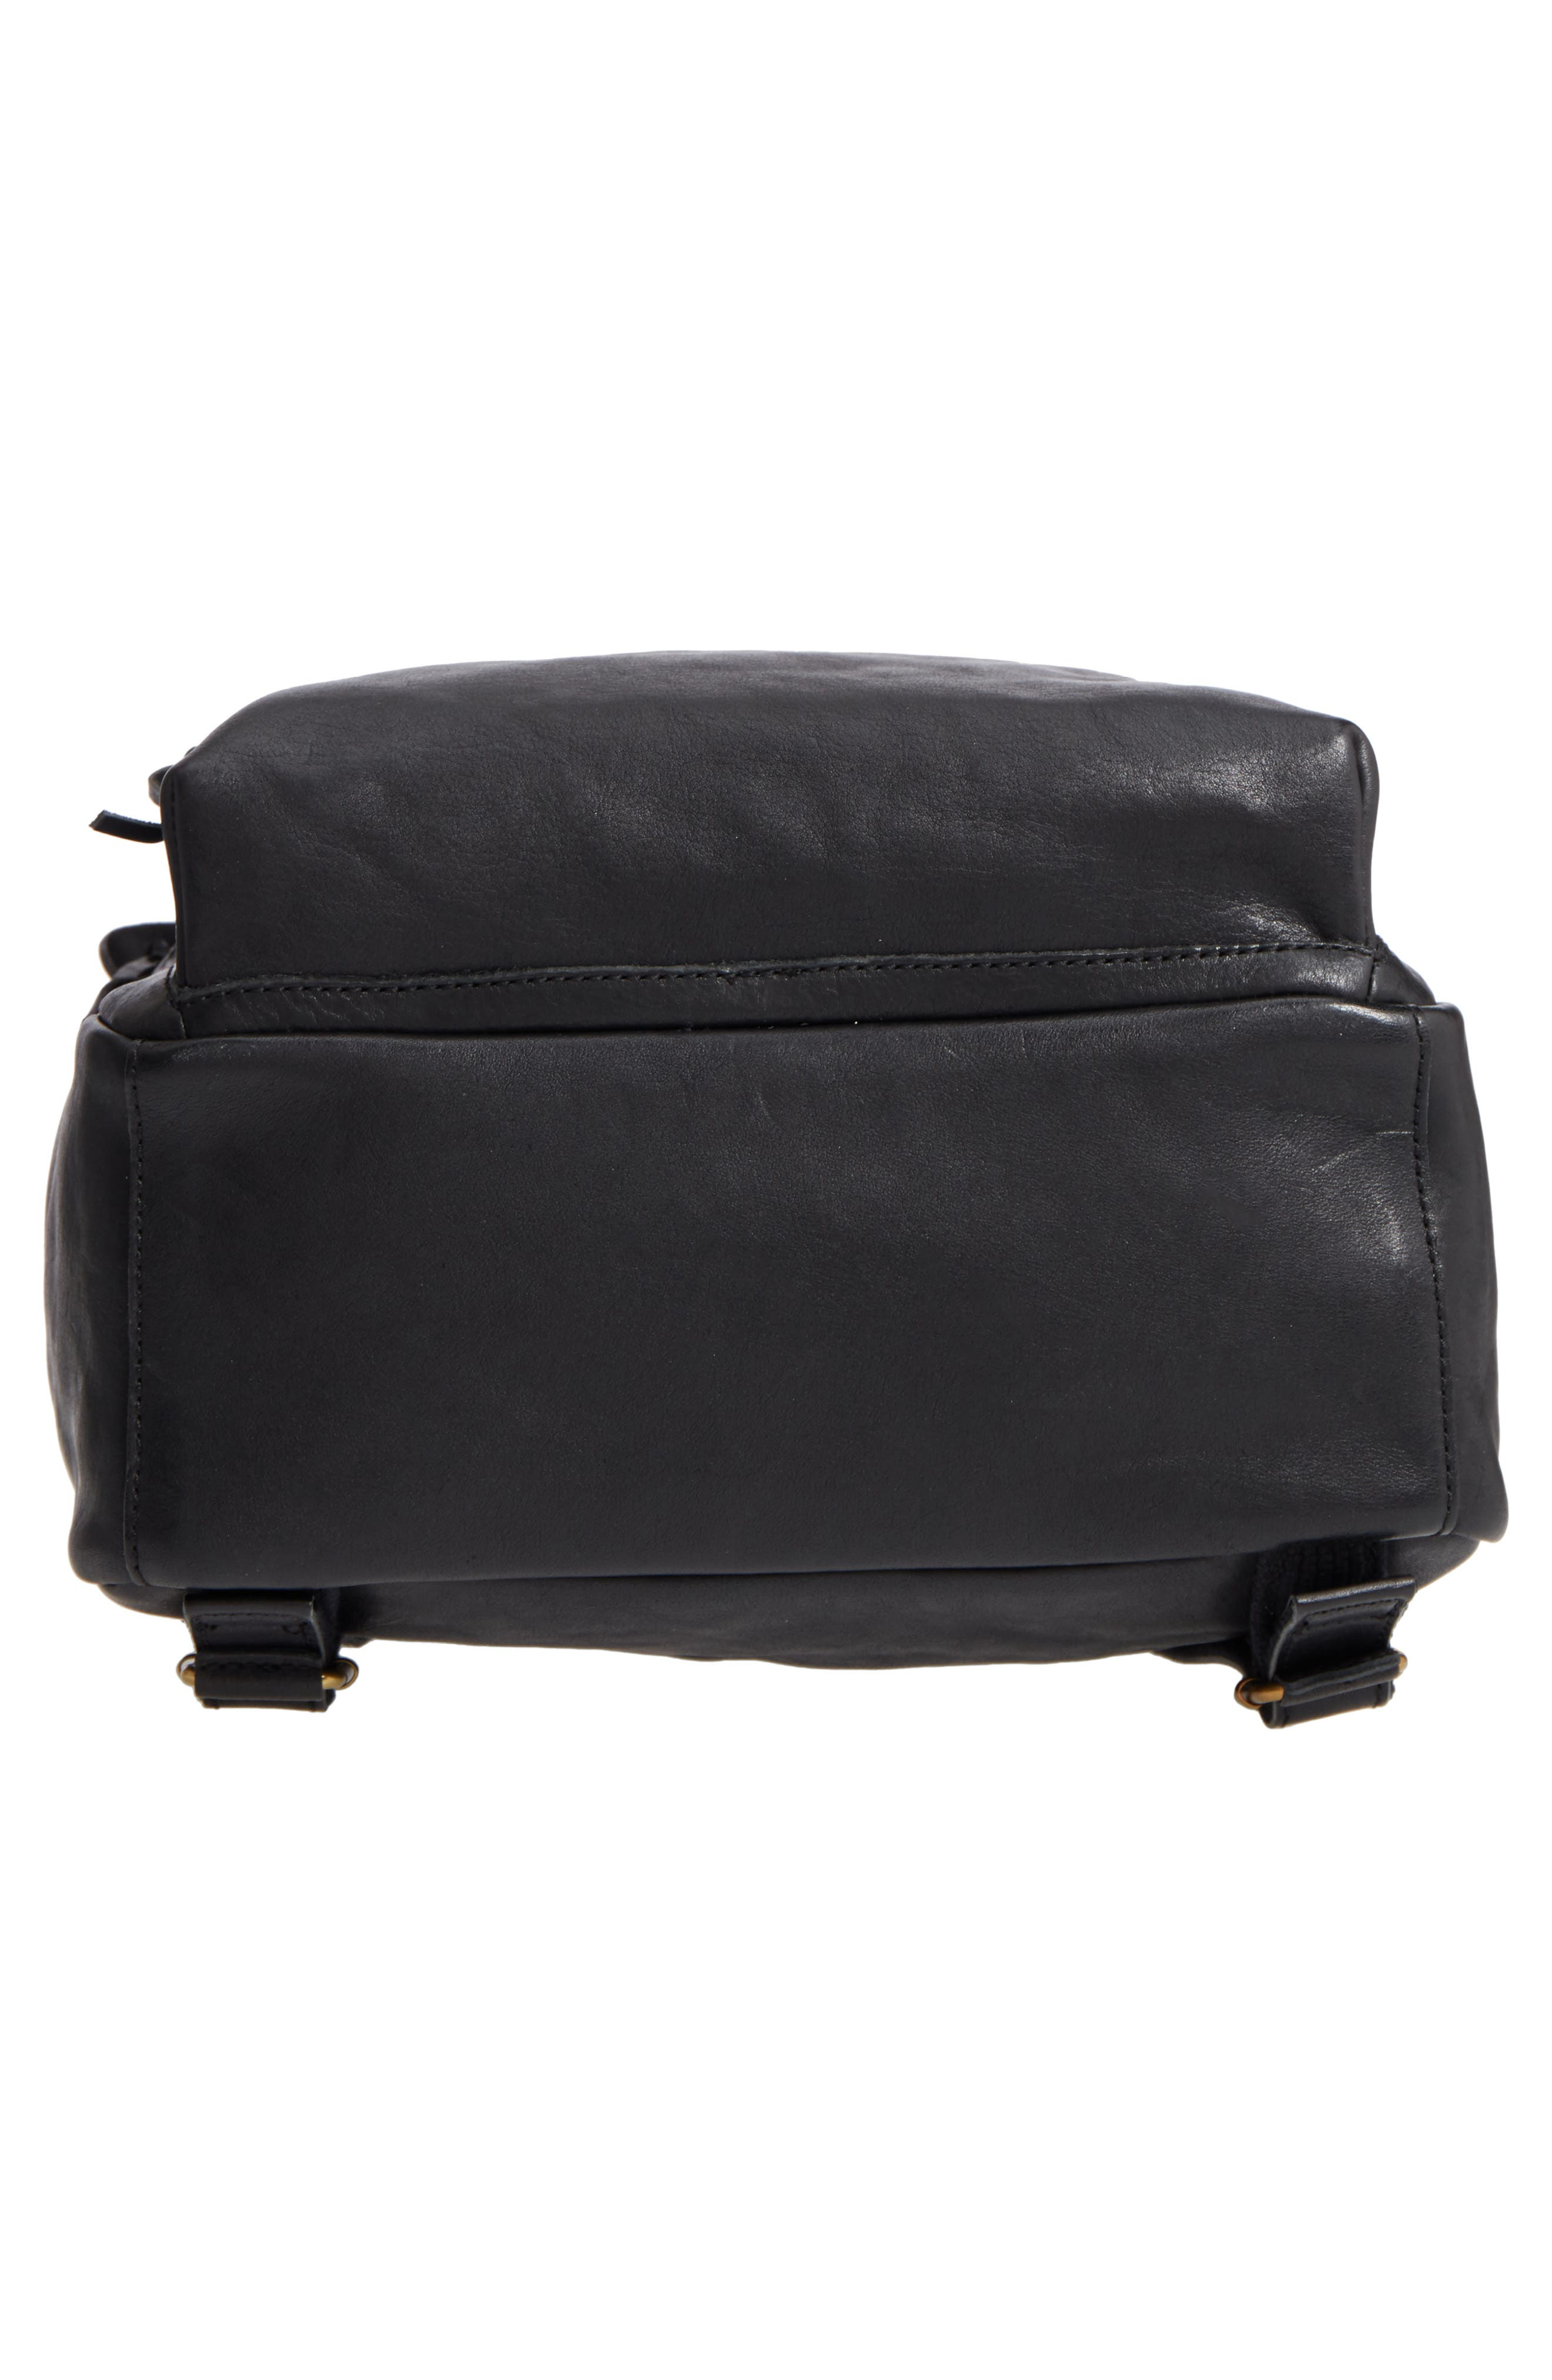 MADEWELL, Lorimer Leather Backpack, Alternate thumbnail 7, color, TRUE BLACK